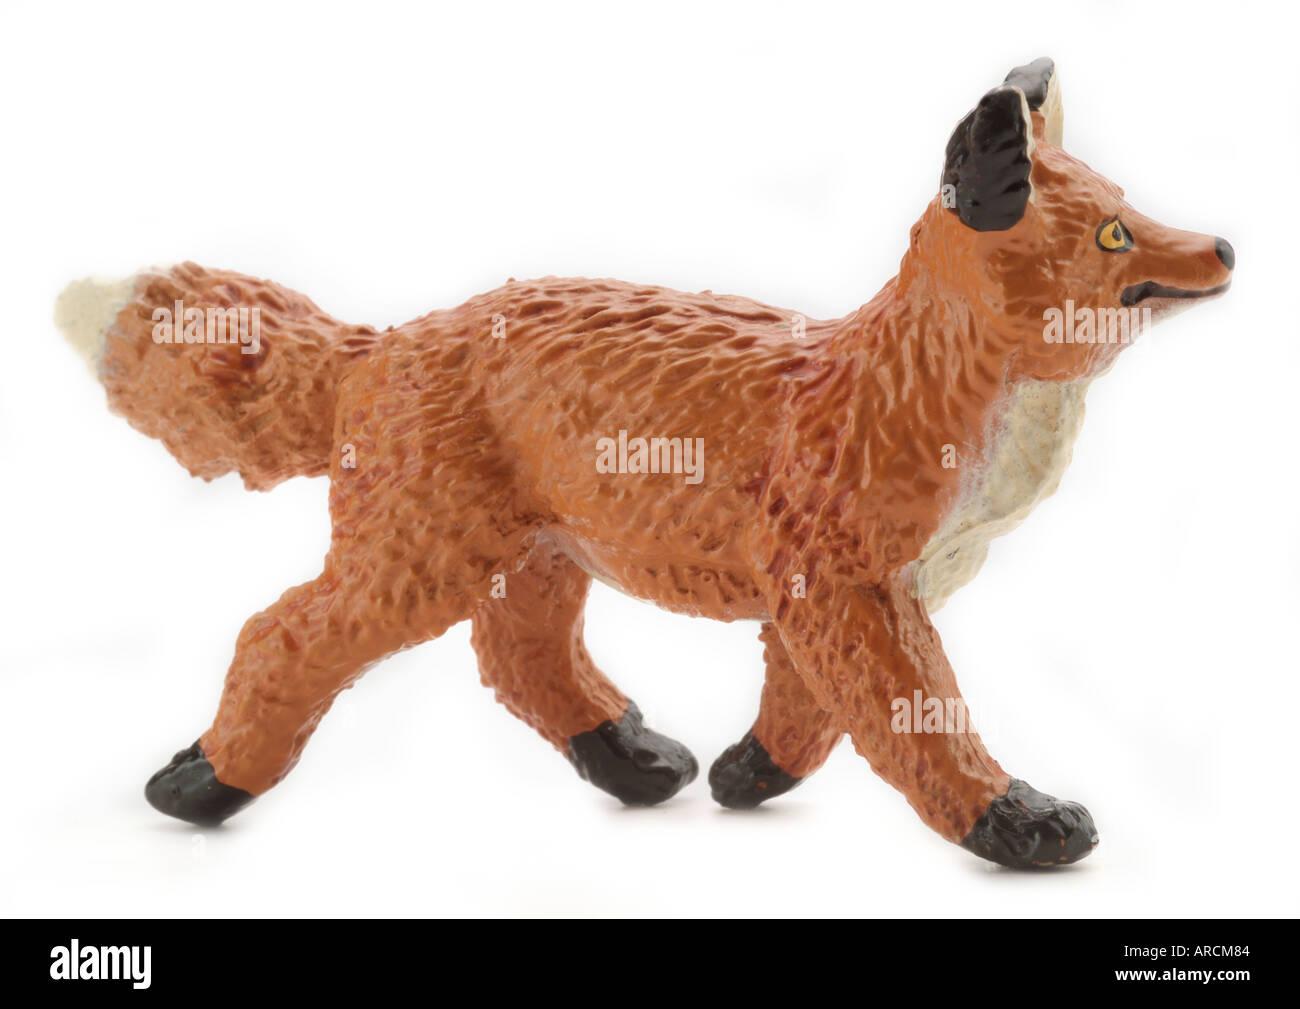 Fox Plastic Farm Zoo Animals Figure Cartoon England Uk United